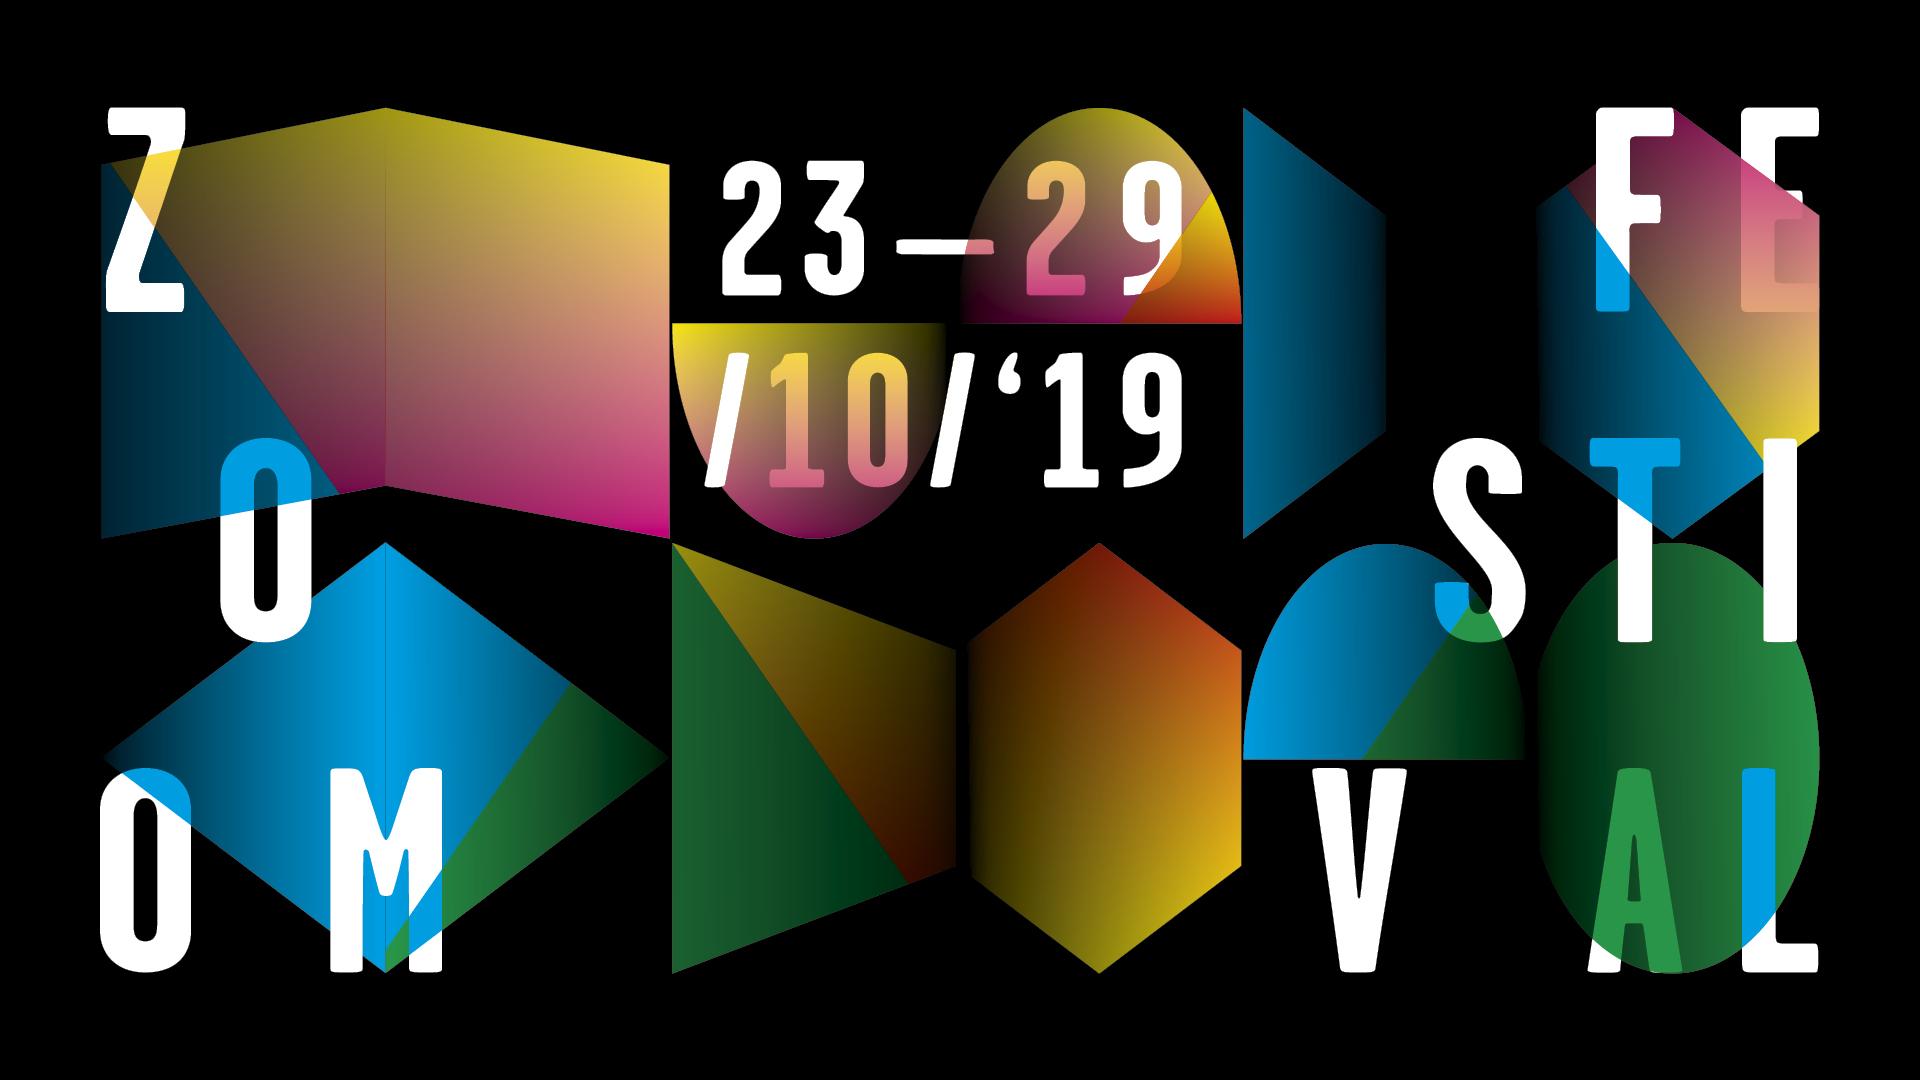 Zoom festival 2019 u Rijeci